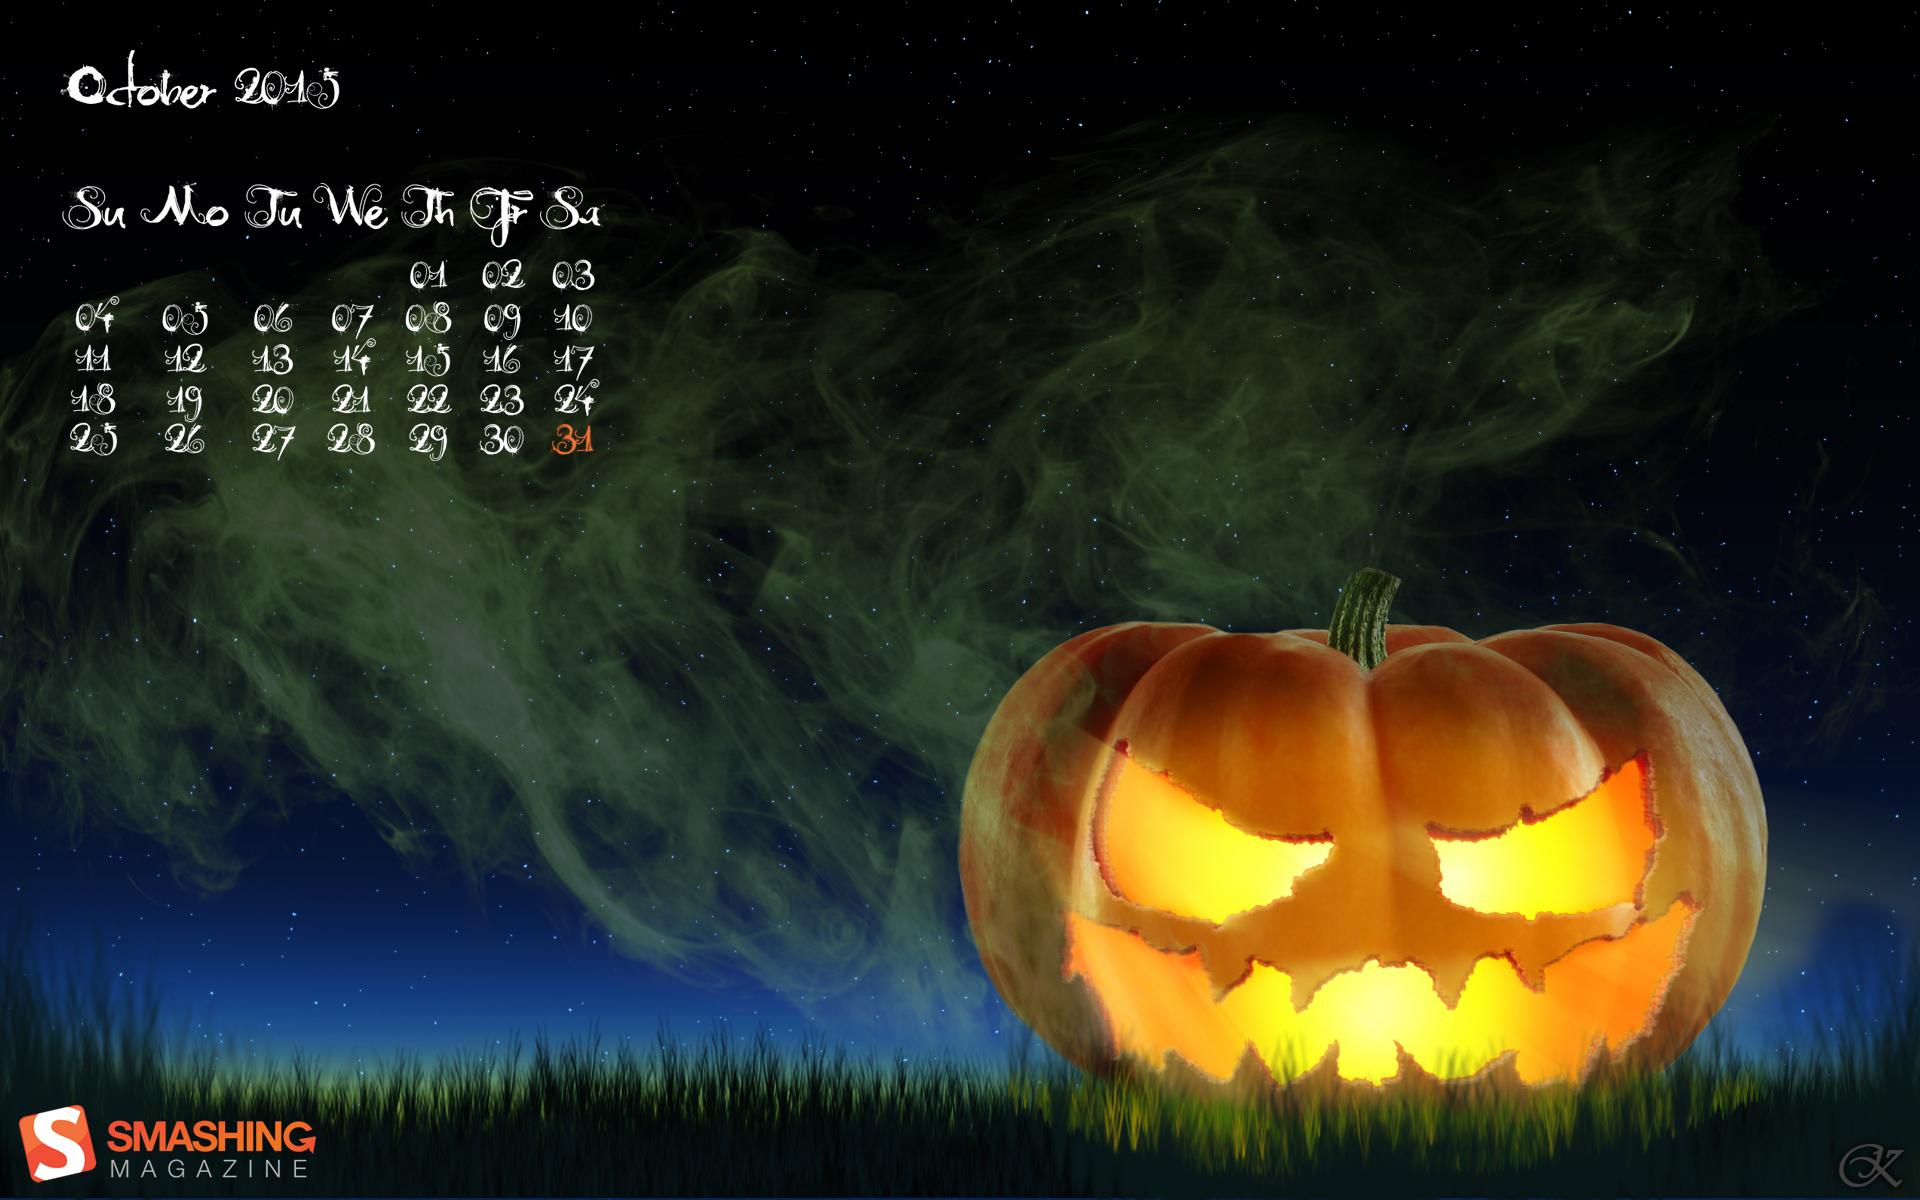 Creepy Pumpkin Desktop Calendars Wallpapers October 2015 1920x1200